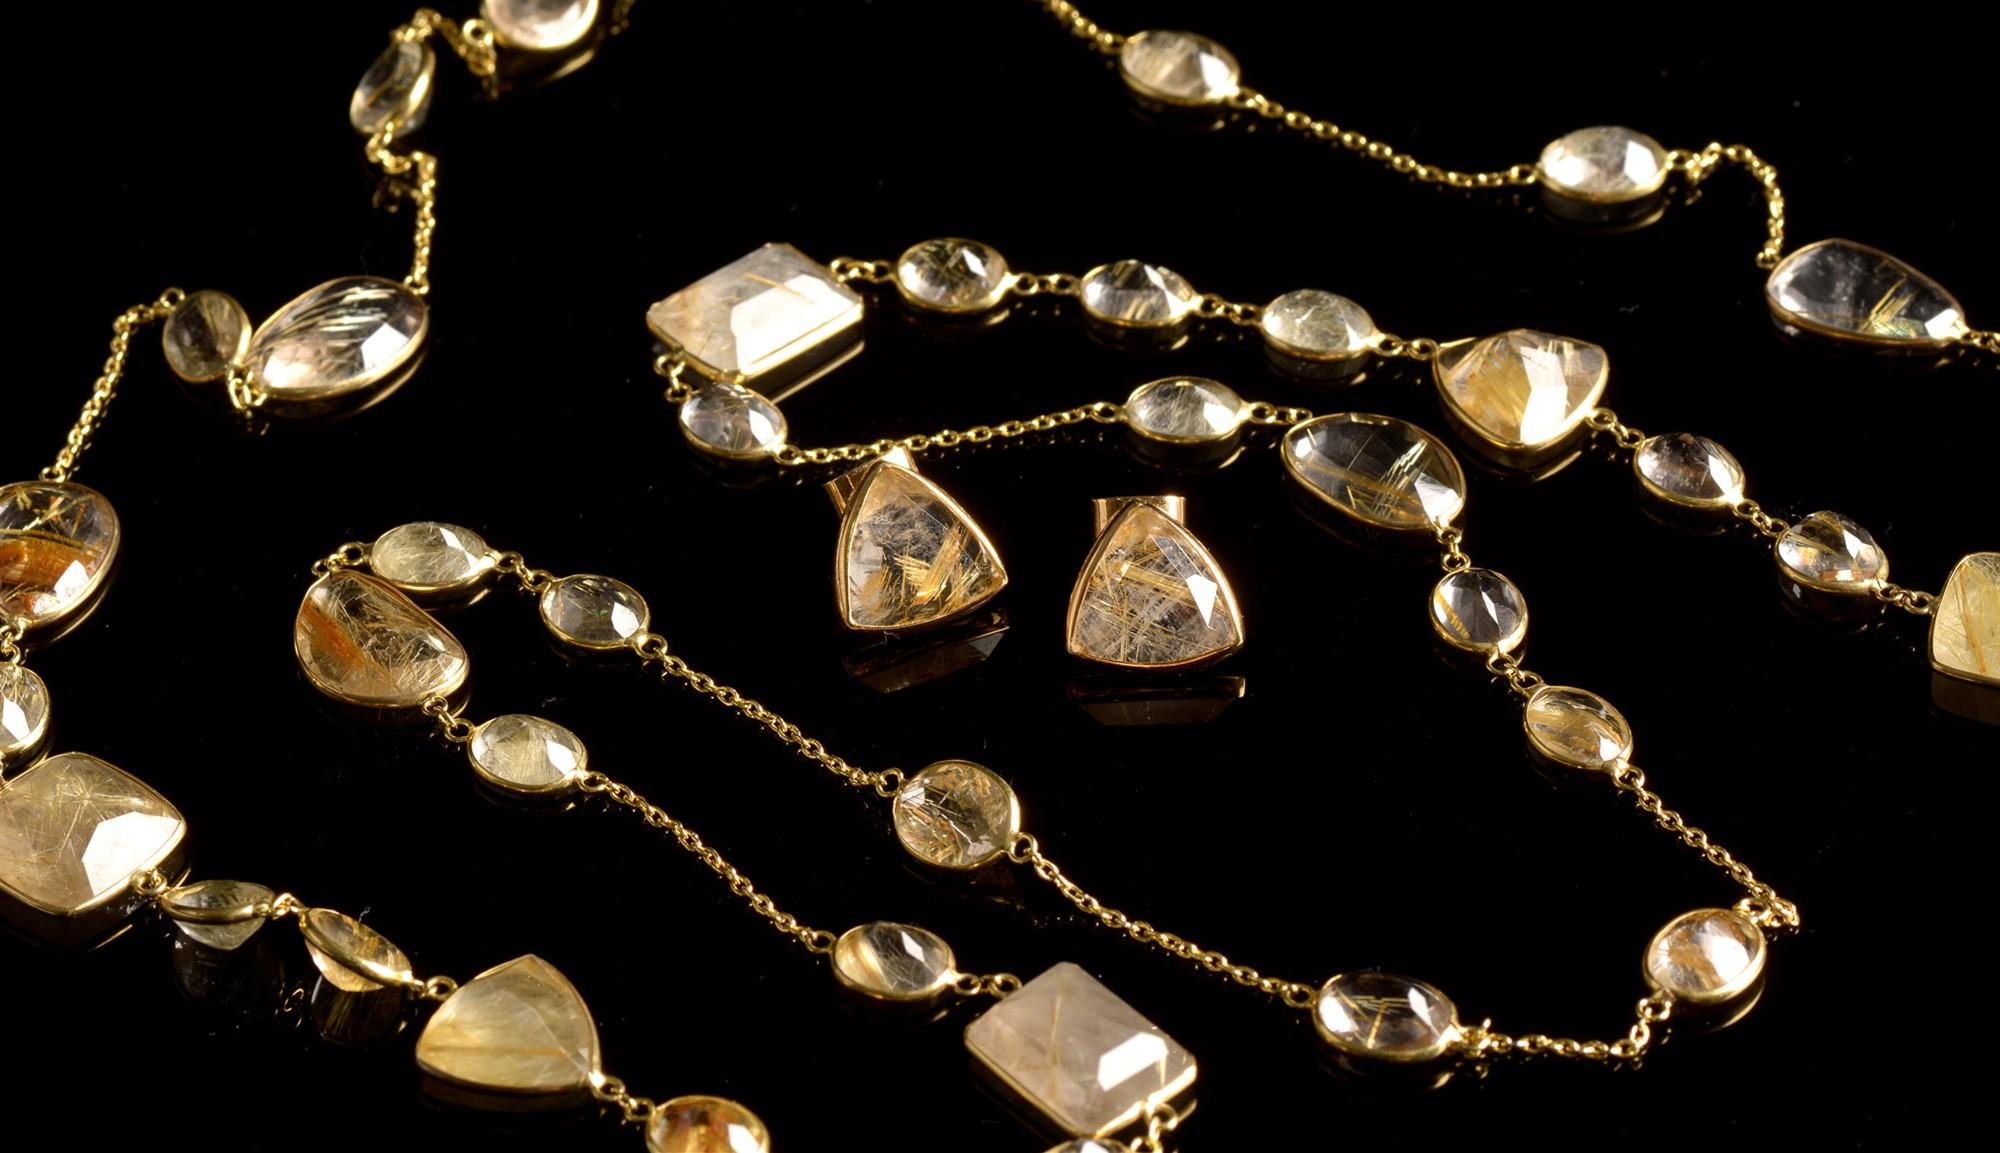 Lot 520 - Rutile quartz necklace and earrings